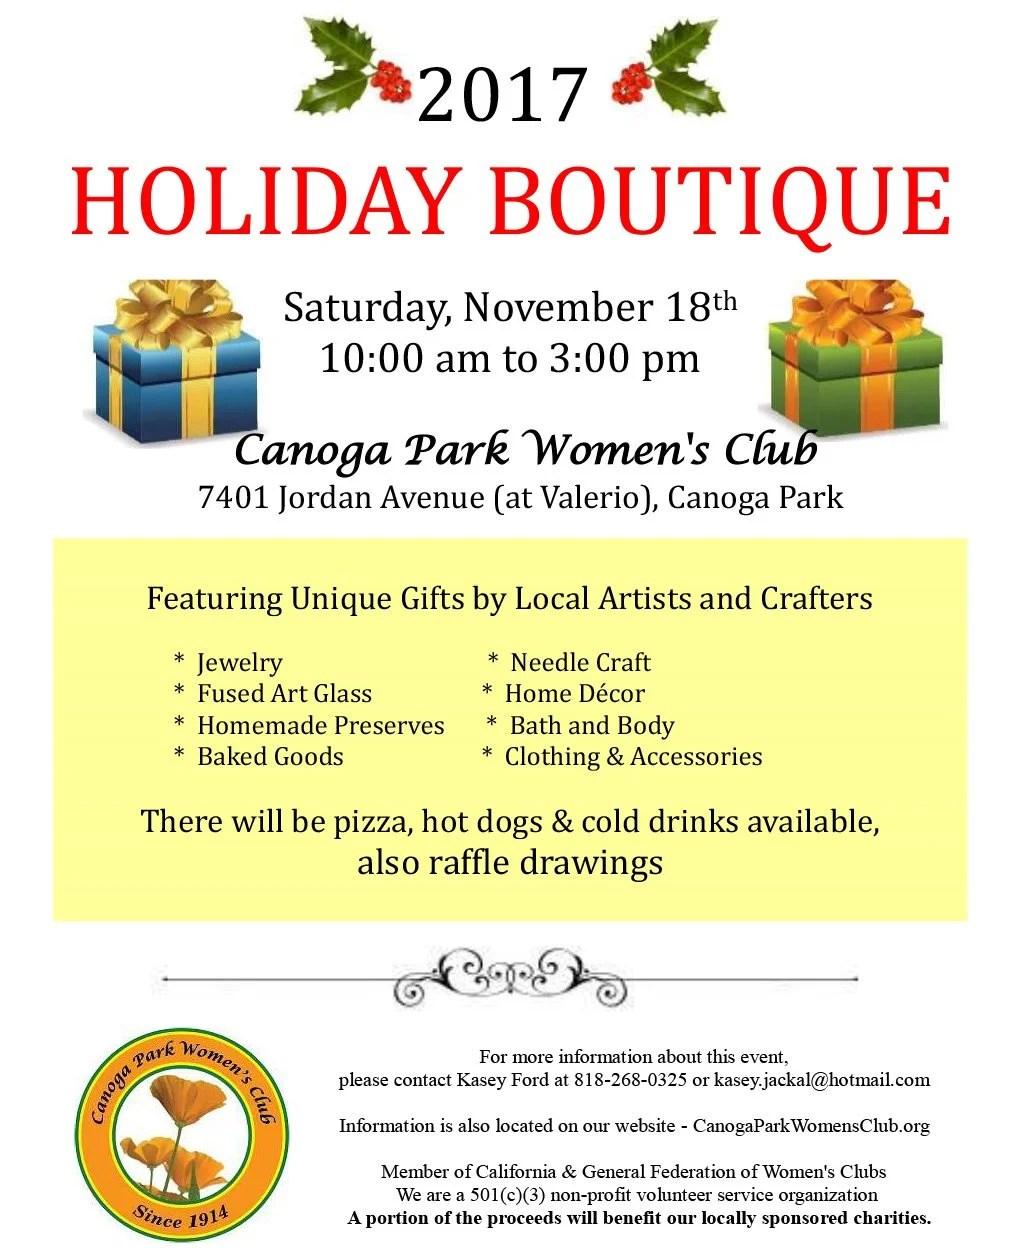 Canoga Park Women's Club 2017 Holiday Boutique